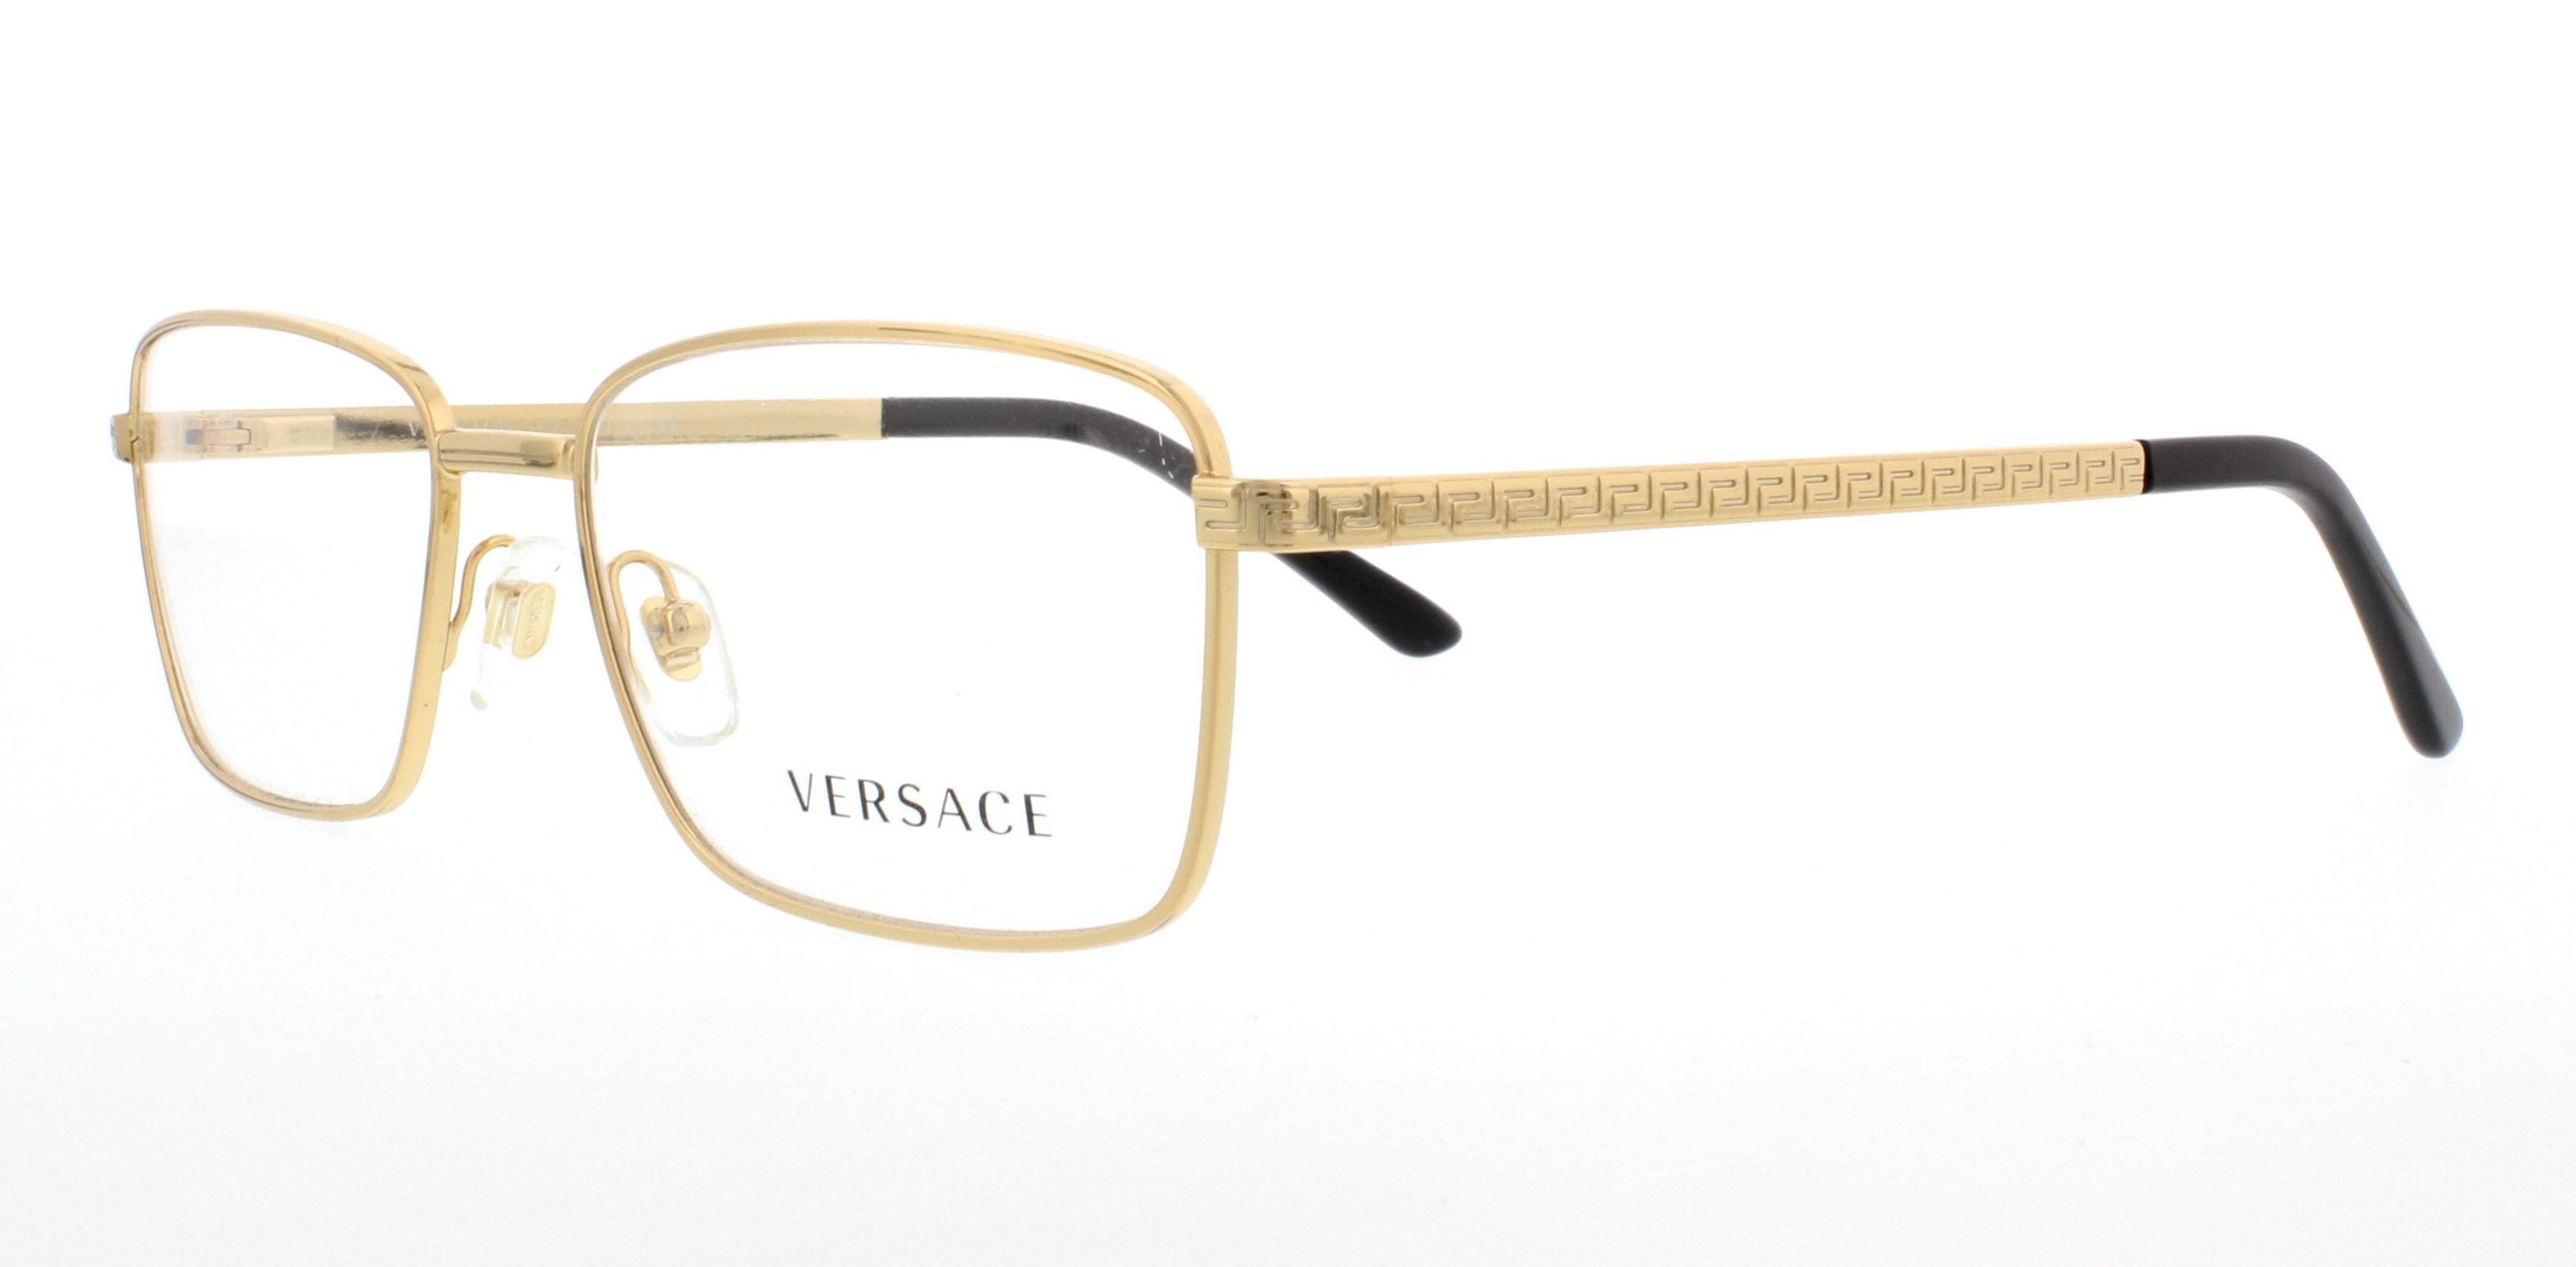 Versace Mens Glasses Gold - Best Glasses Cnapracticetesting.Com 2018